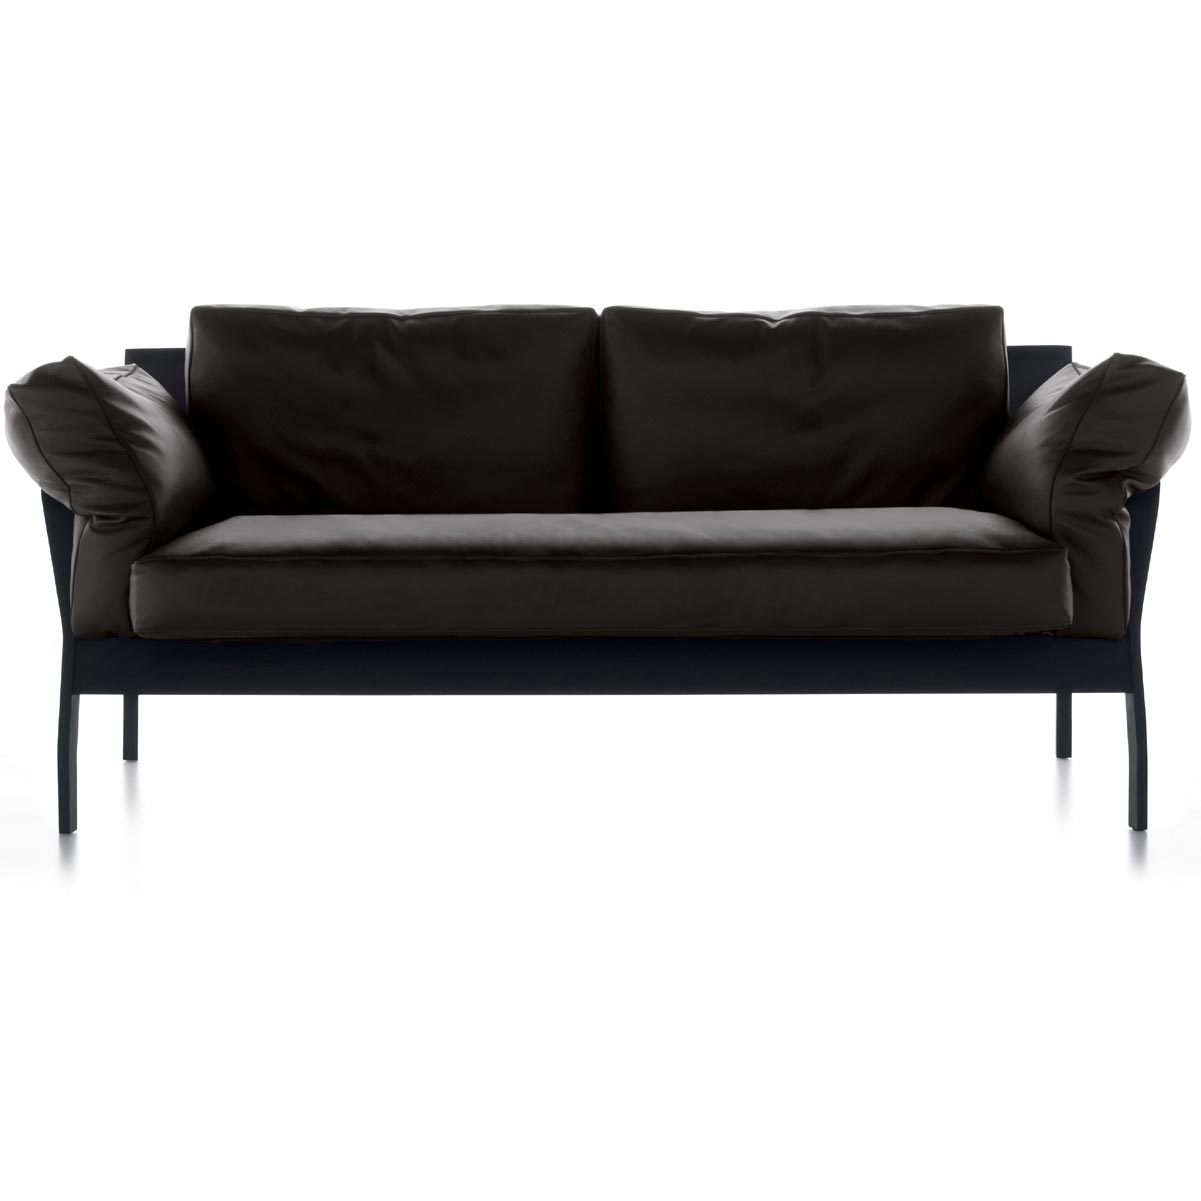 sofaprogramm eloro von cassina. Black Bedroom Furniture Sets. Home Design Ideas